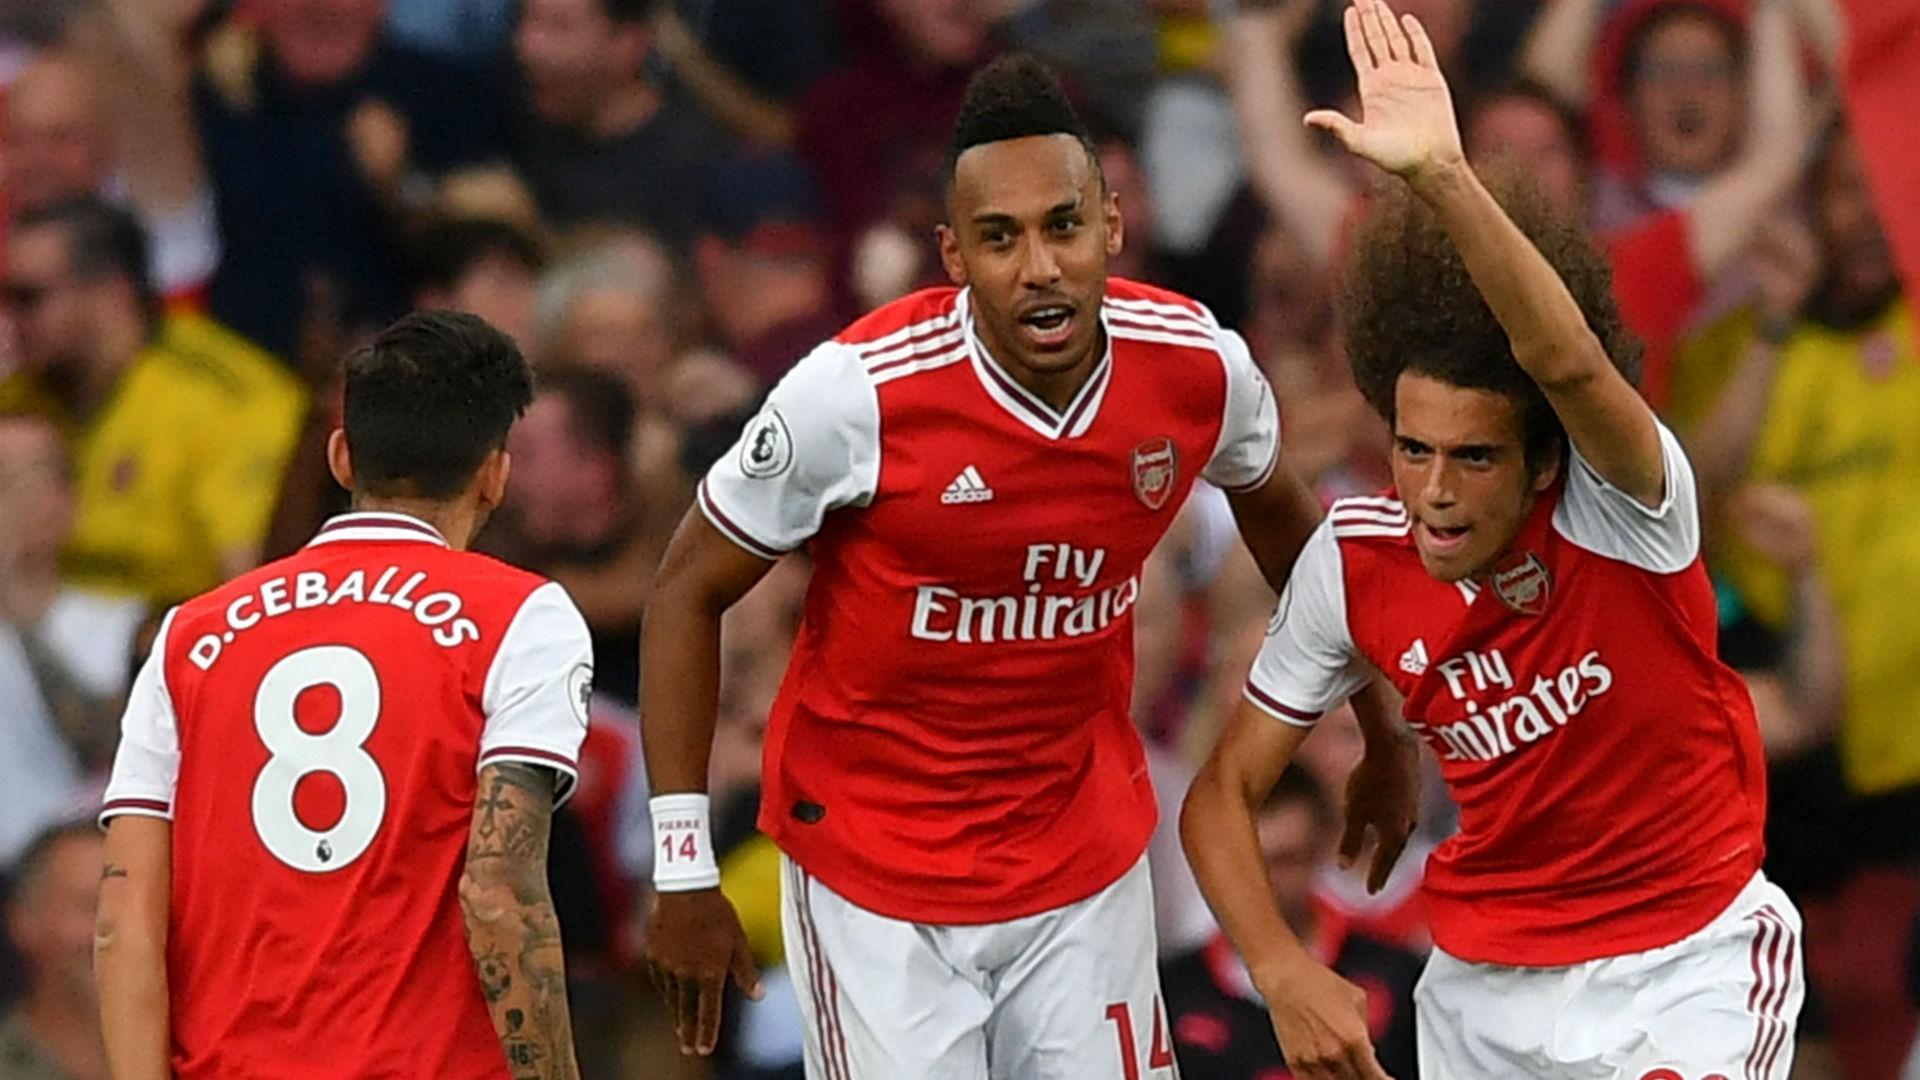 Arsenal 2-2 Tottenham: Gunners battle back through Lacazette and Aubameyang